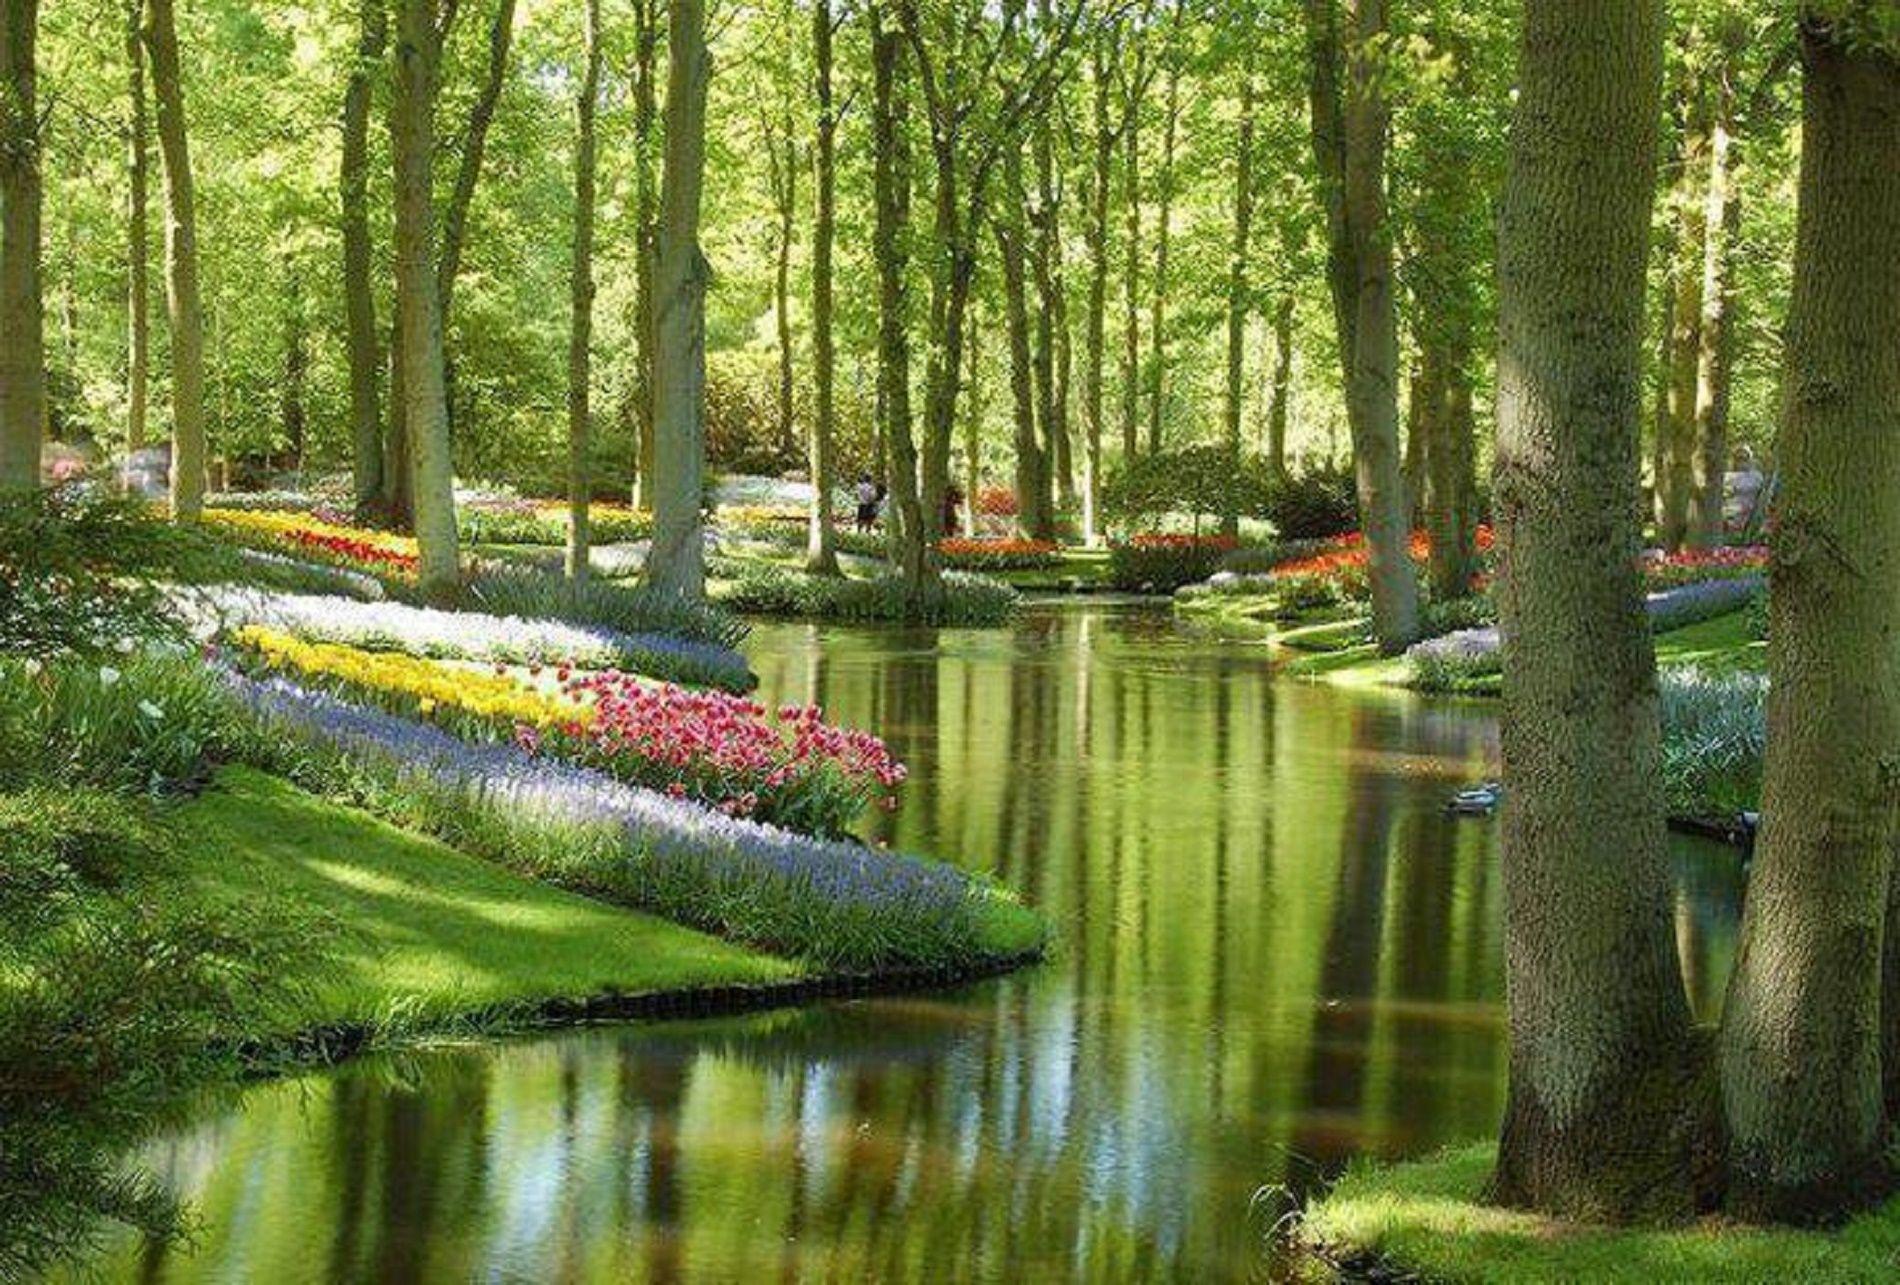 Forest Garden Desktop Background Wallpapers Hd Free 400 x 300